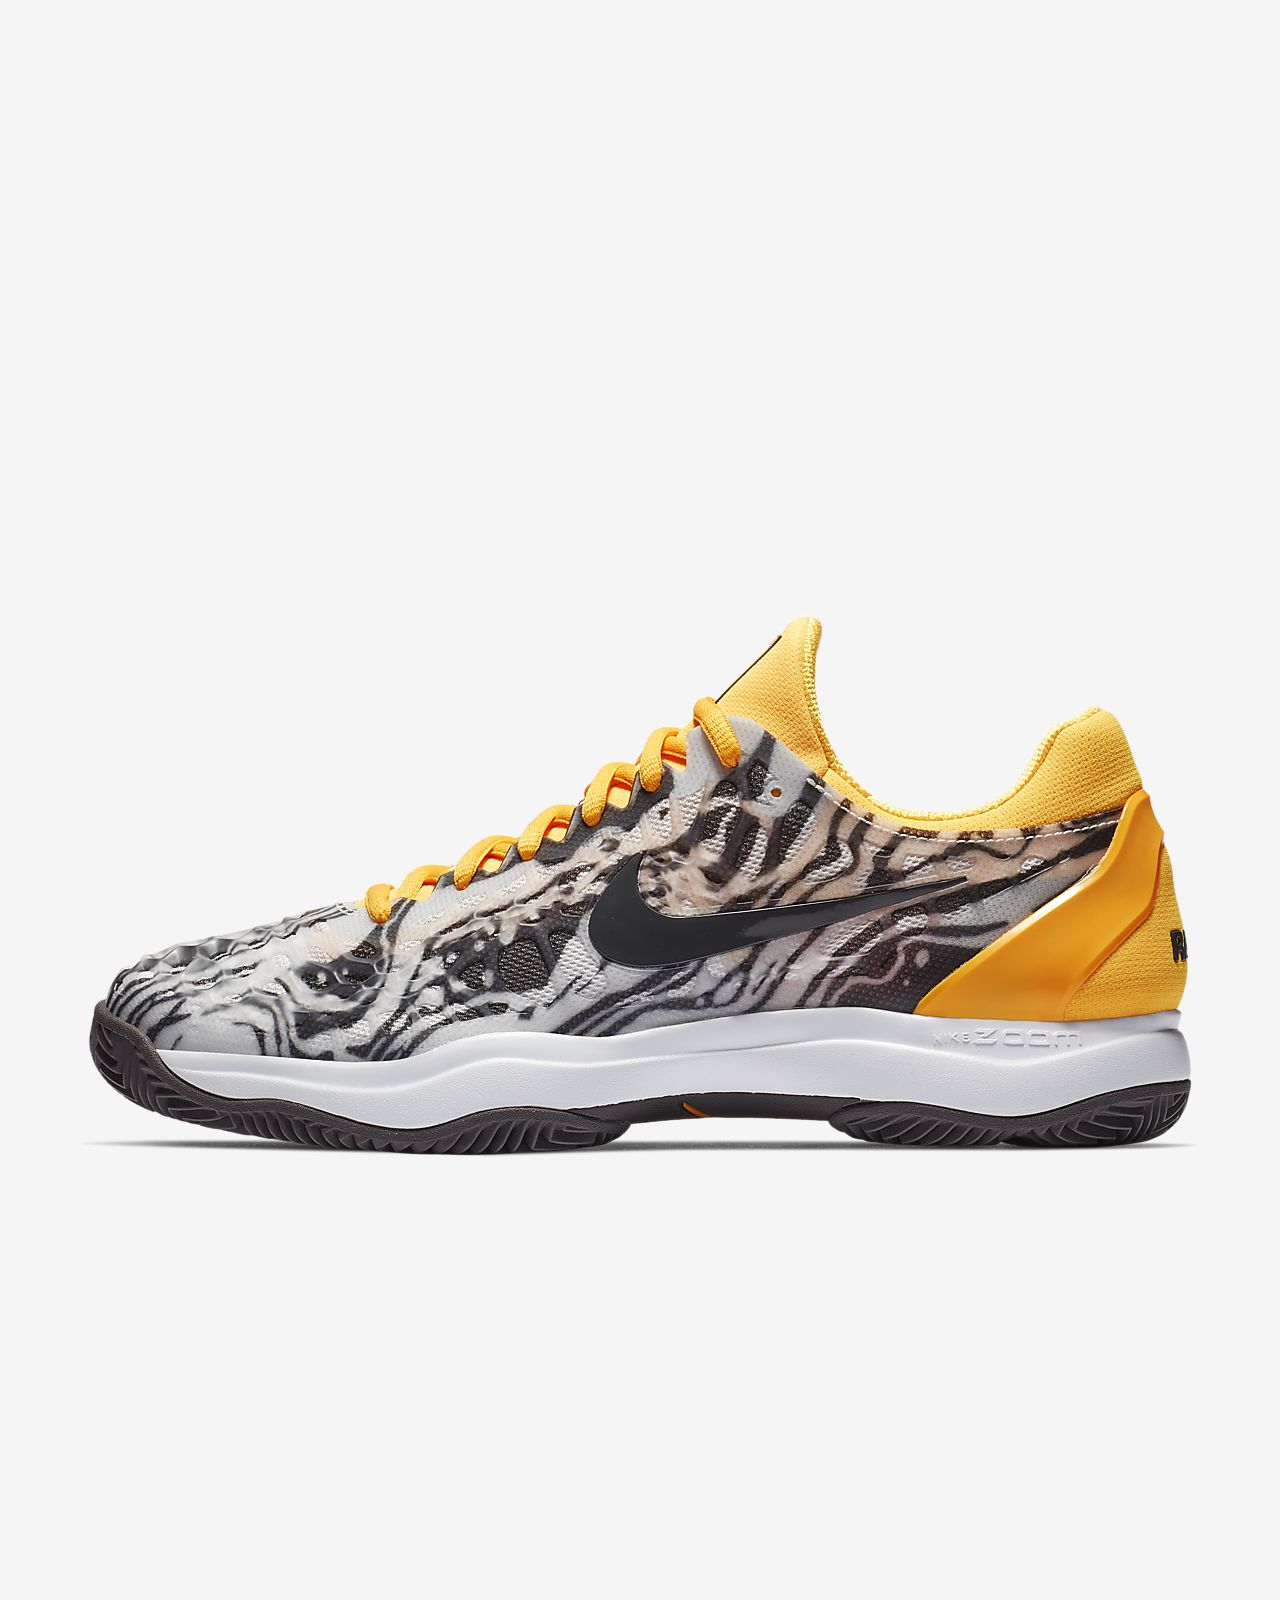 005e59e52cc97 Nike Zoom Cage 3 Clay Zapatillas de tenis - Hombre. Nike.com ES